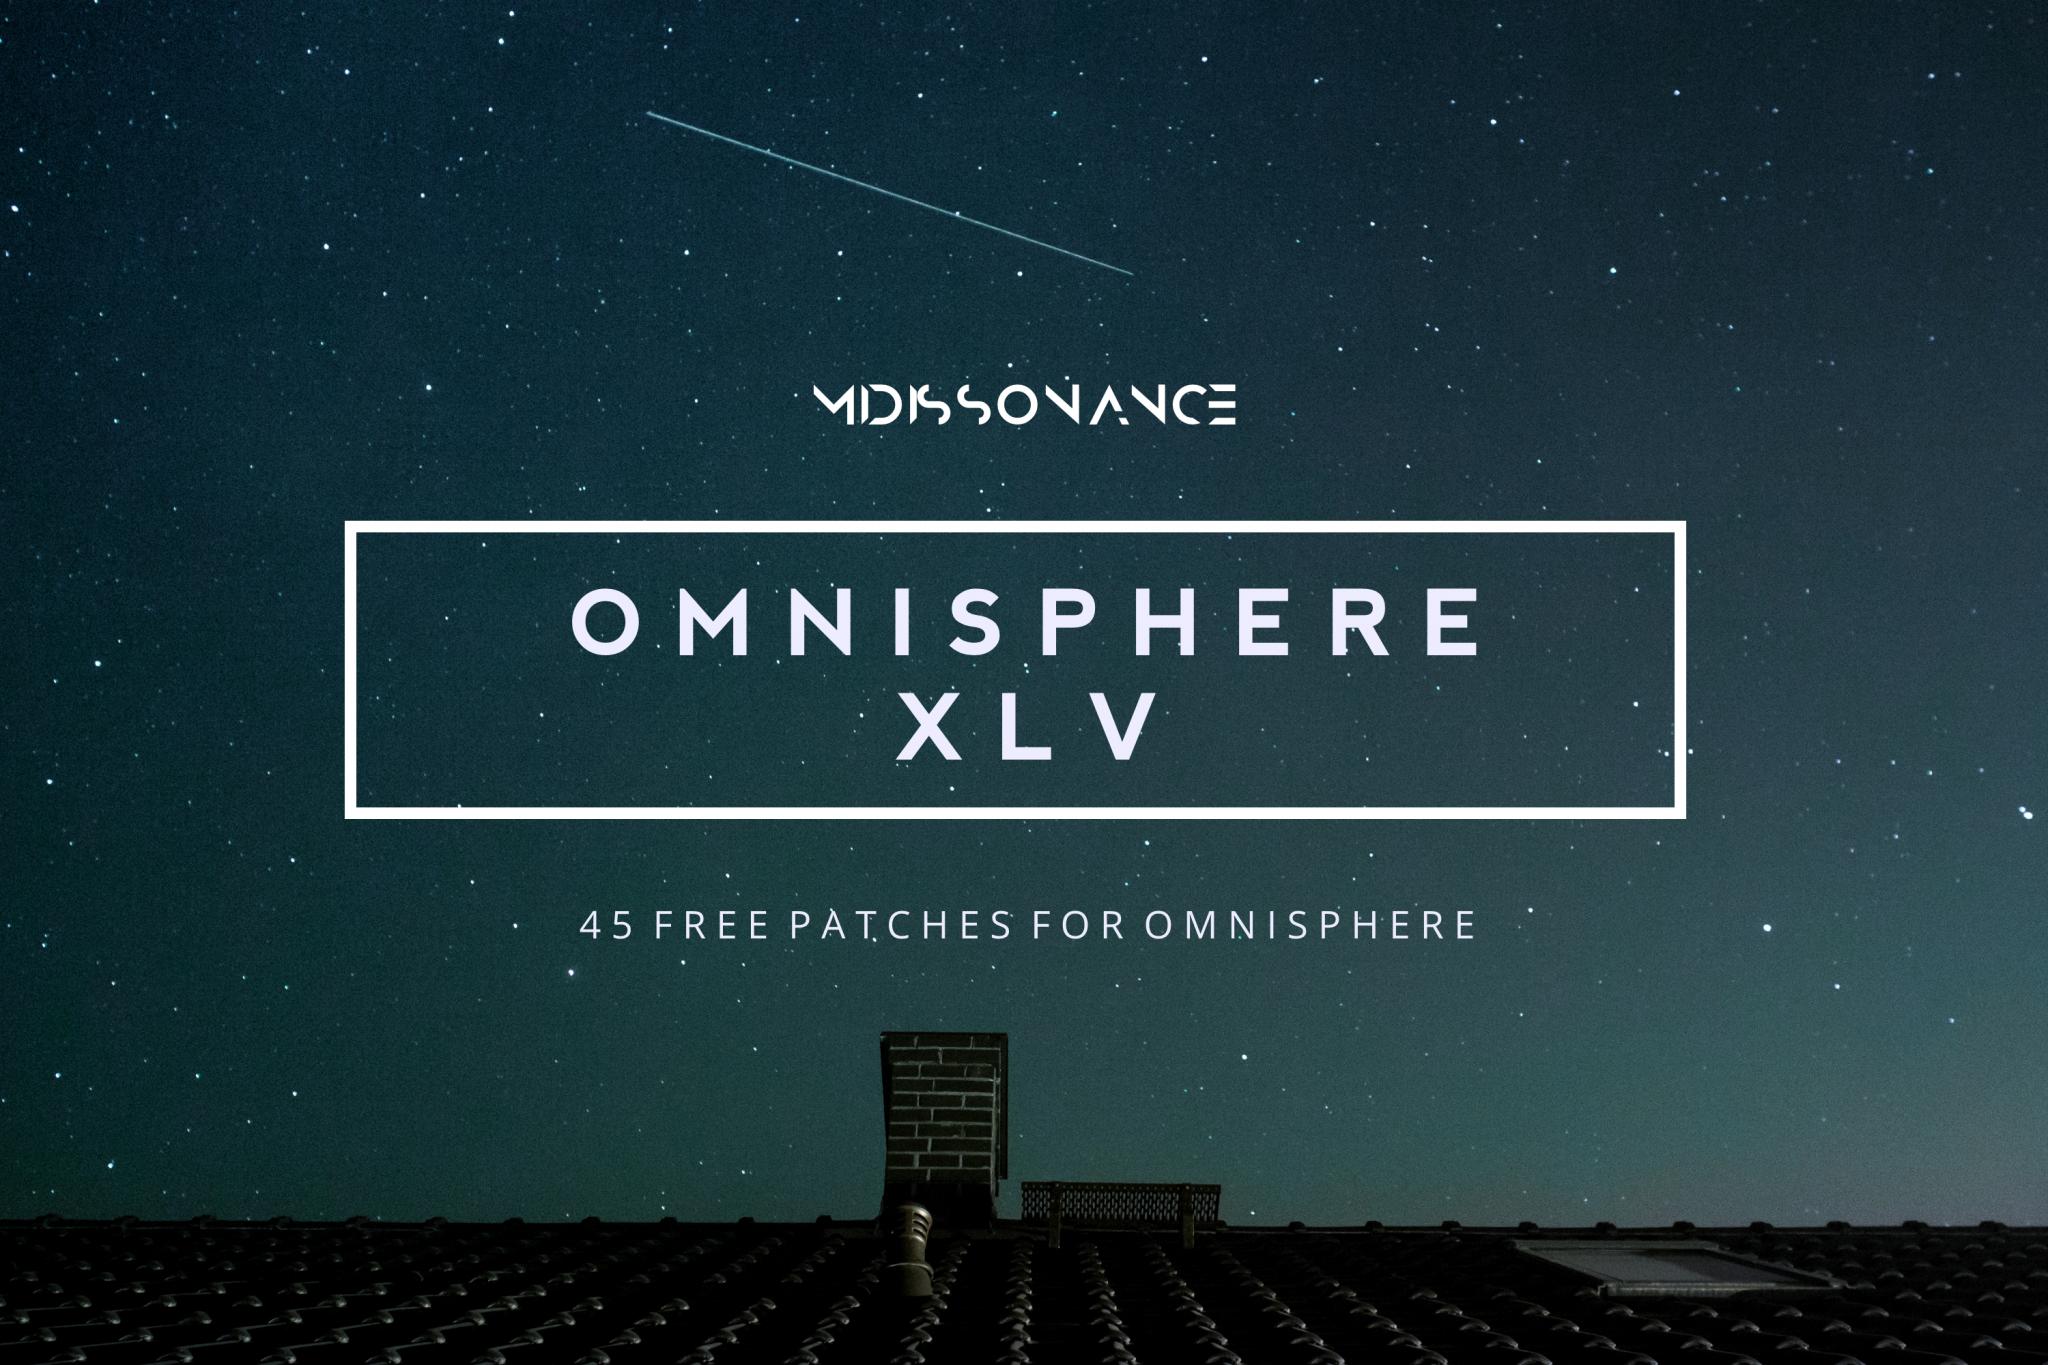 Omnisphere XLV – Free